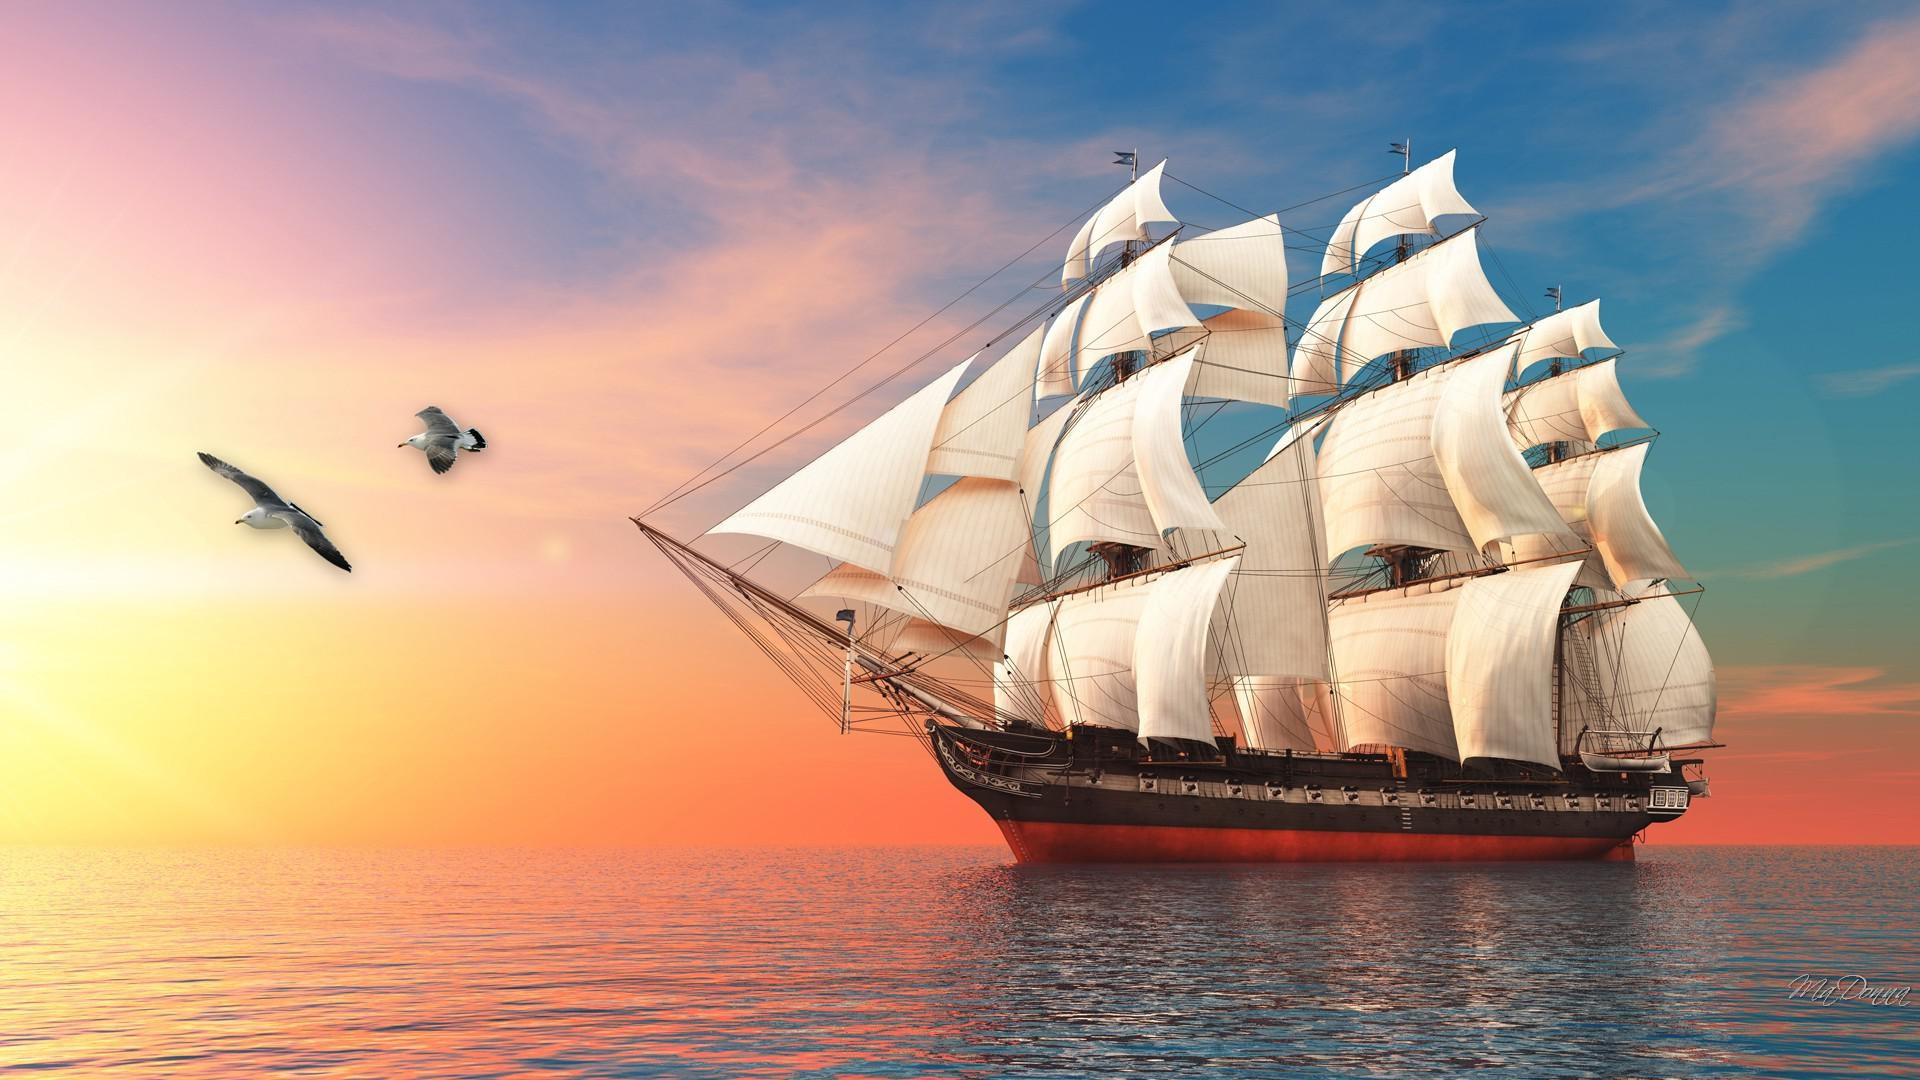 Res: 1920x1080, Tall ship at sunrise HQ WALLPAPER 106766